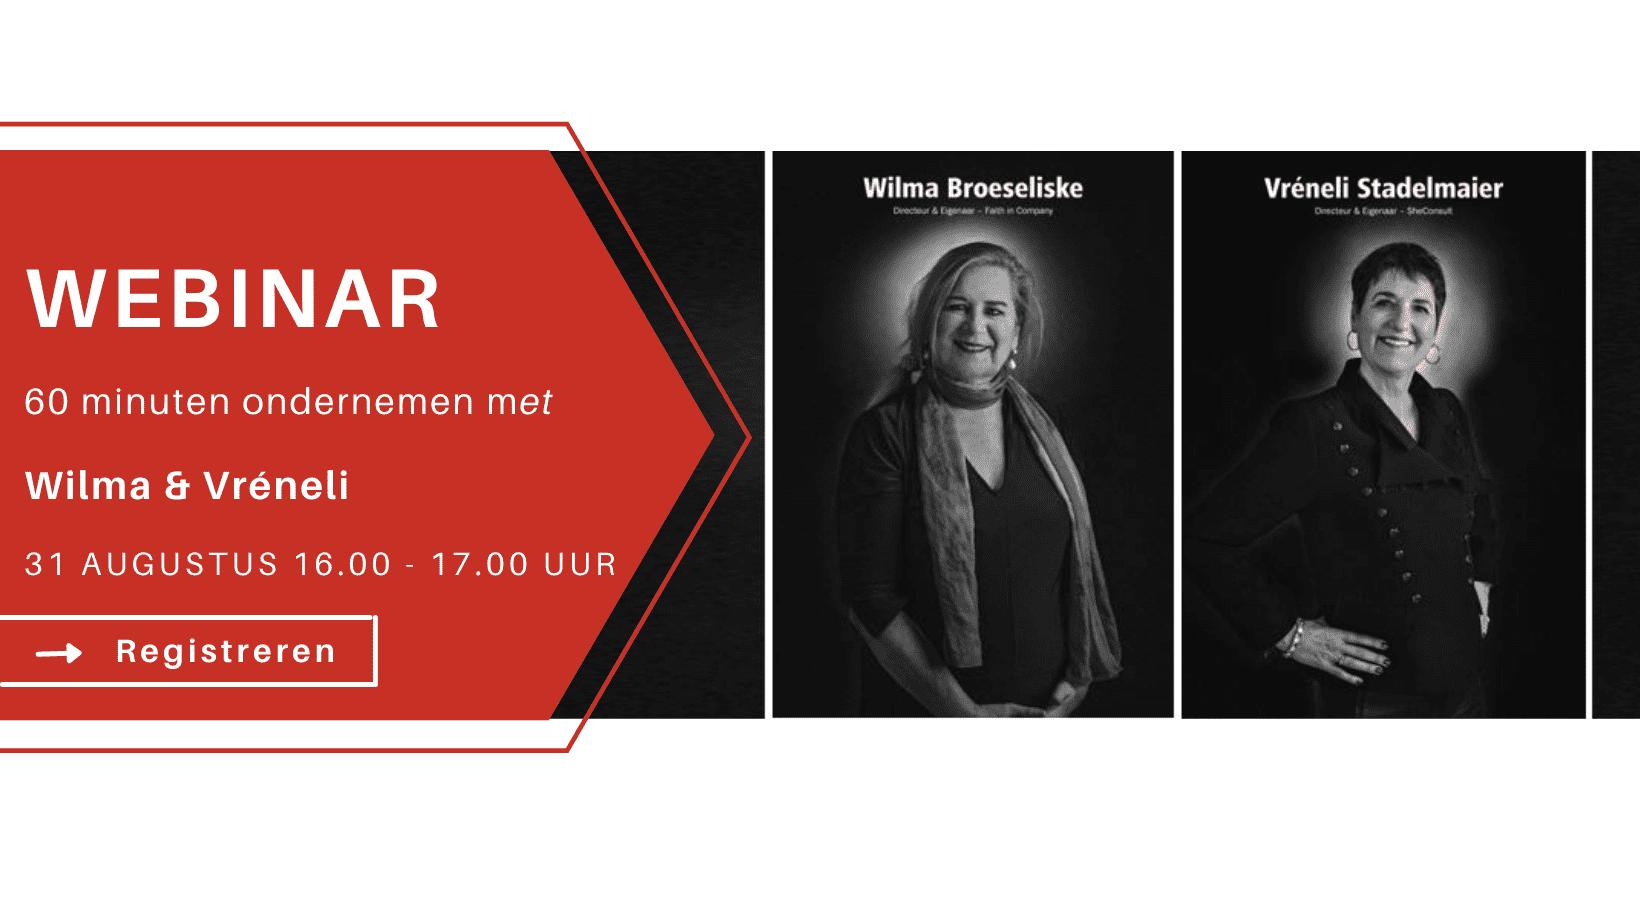 webinar 60 minuten ondernemen met wilma-broeseliske-en-vreneli-stadelmaier - inspiredbycor.nl